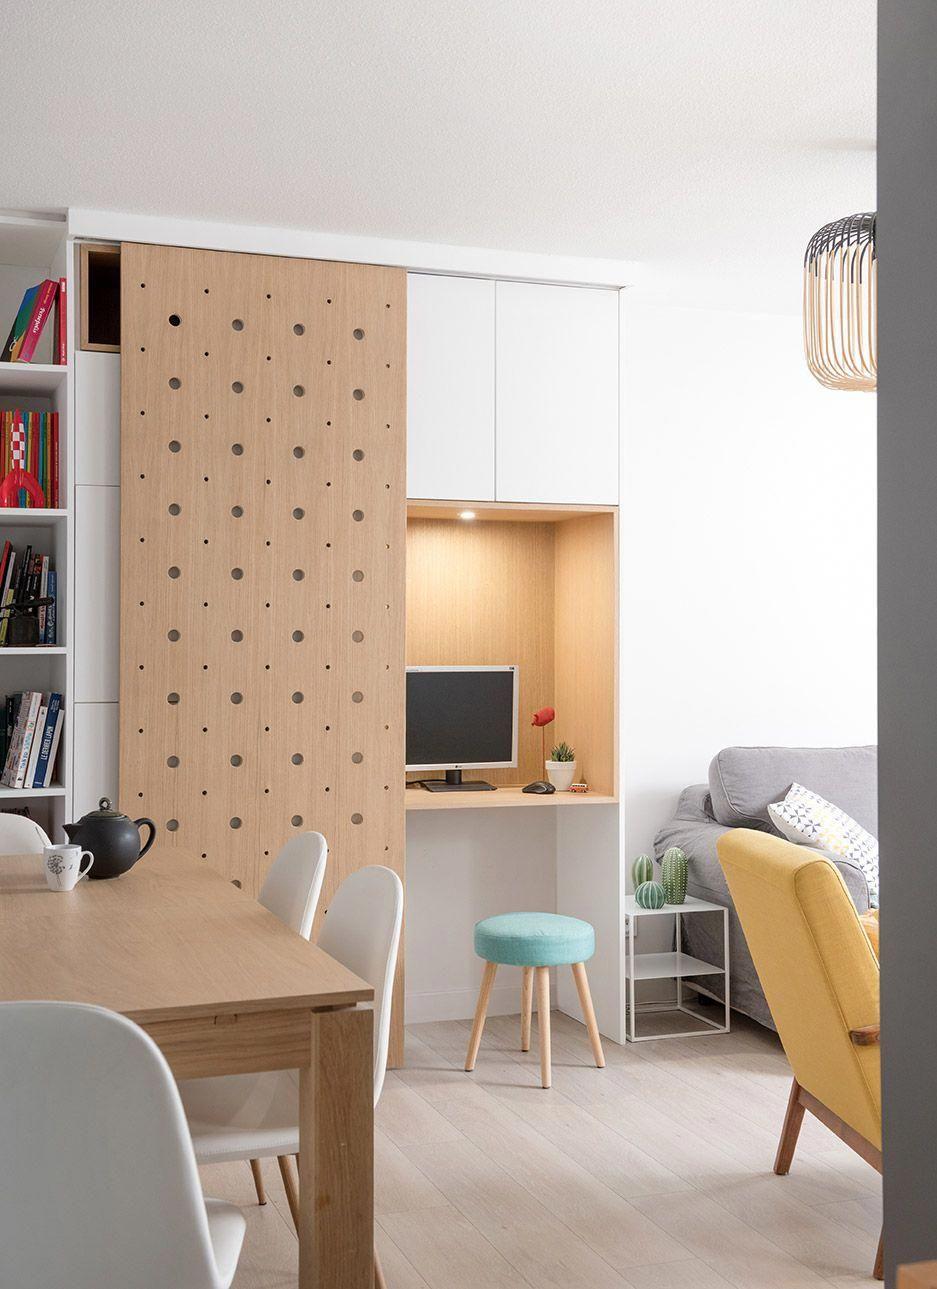 Home office design hawaiian decor built in ideas also rh pinterest